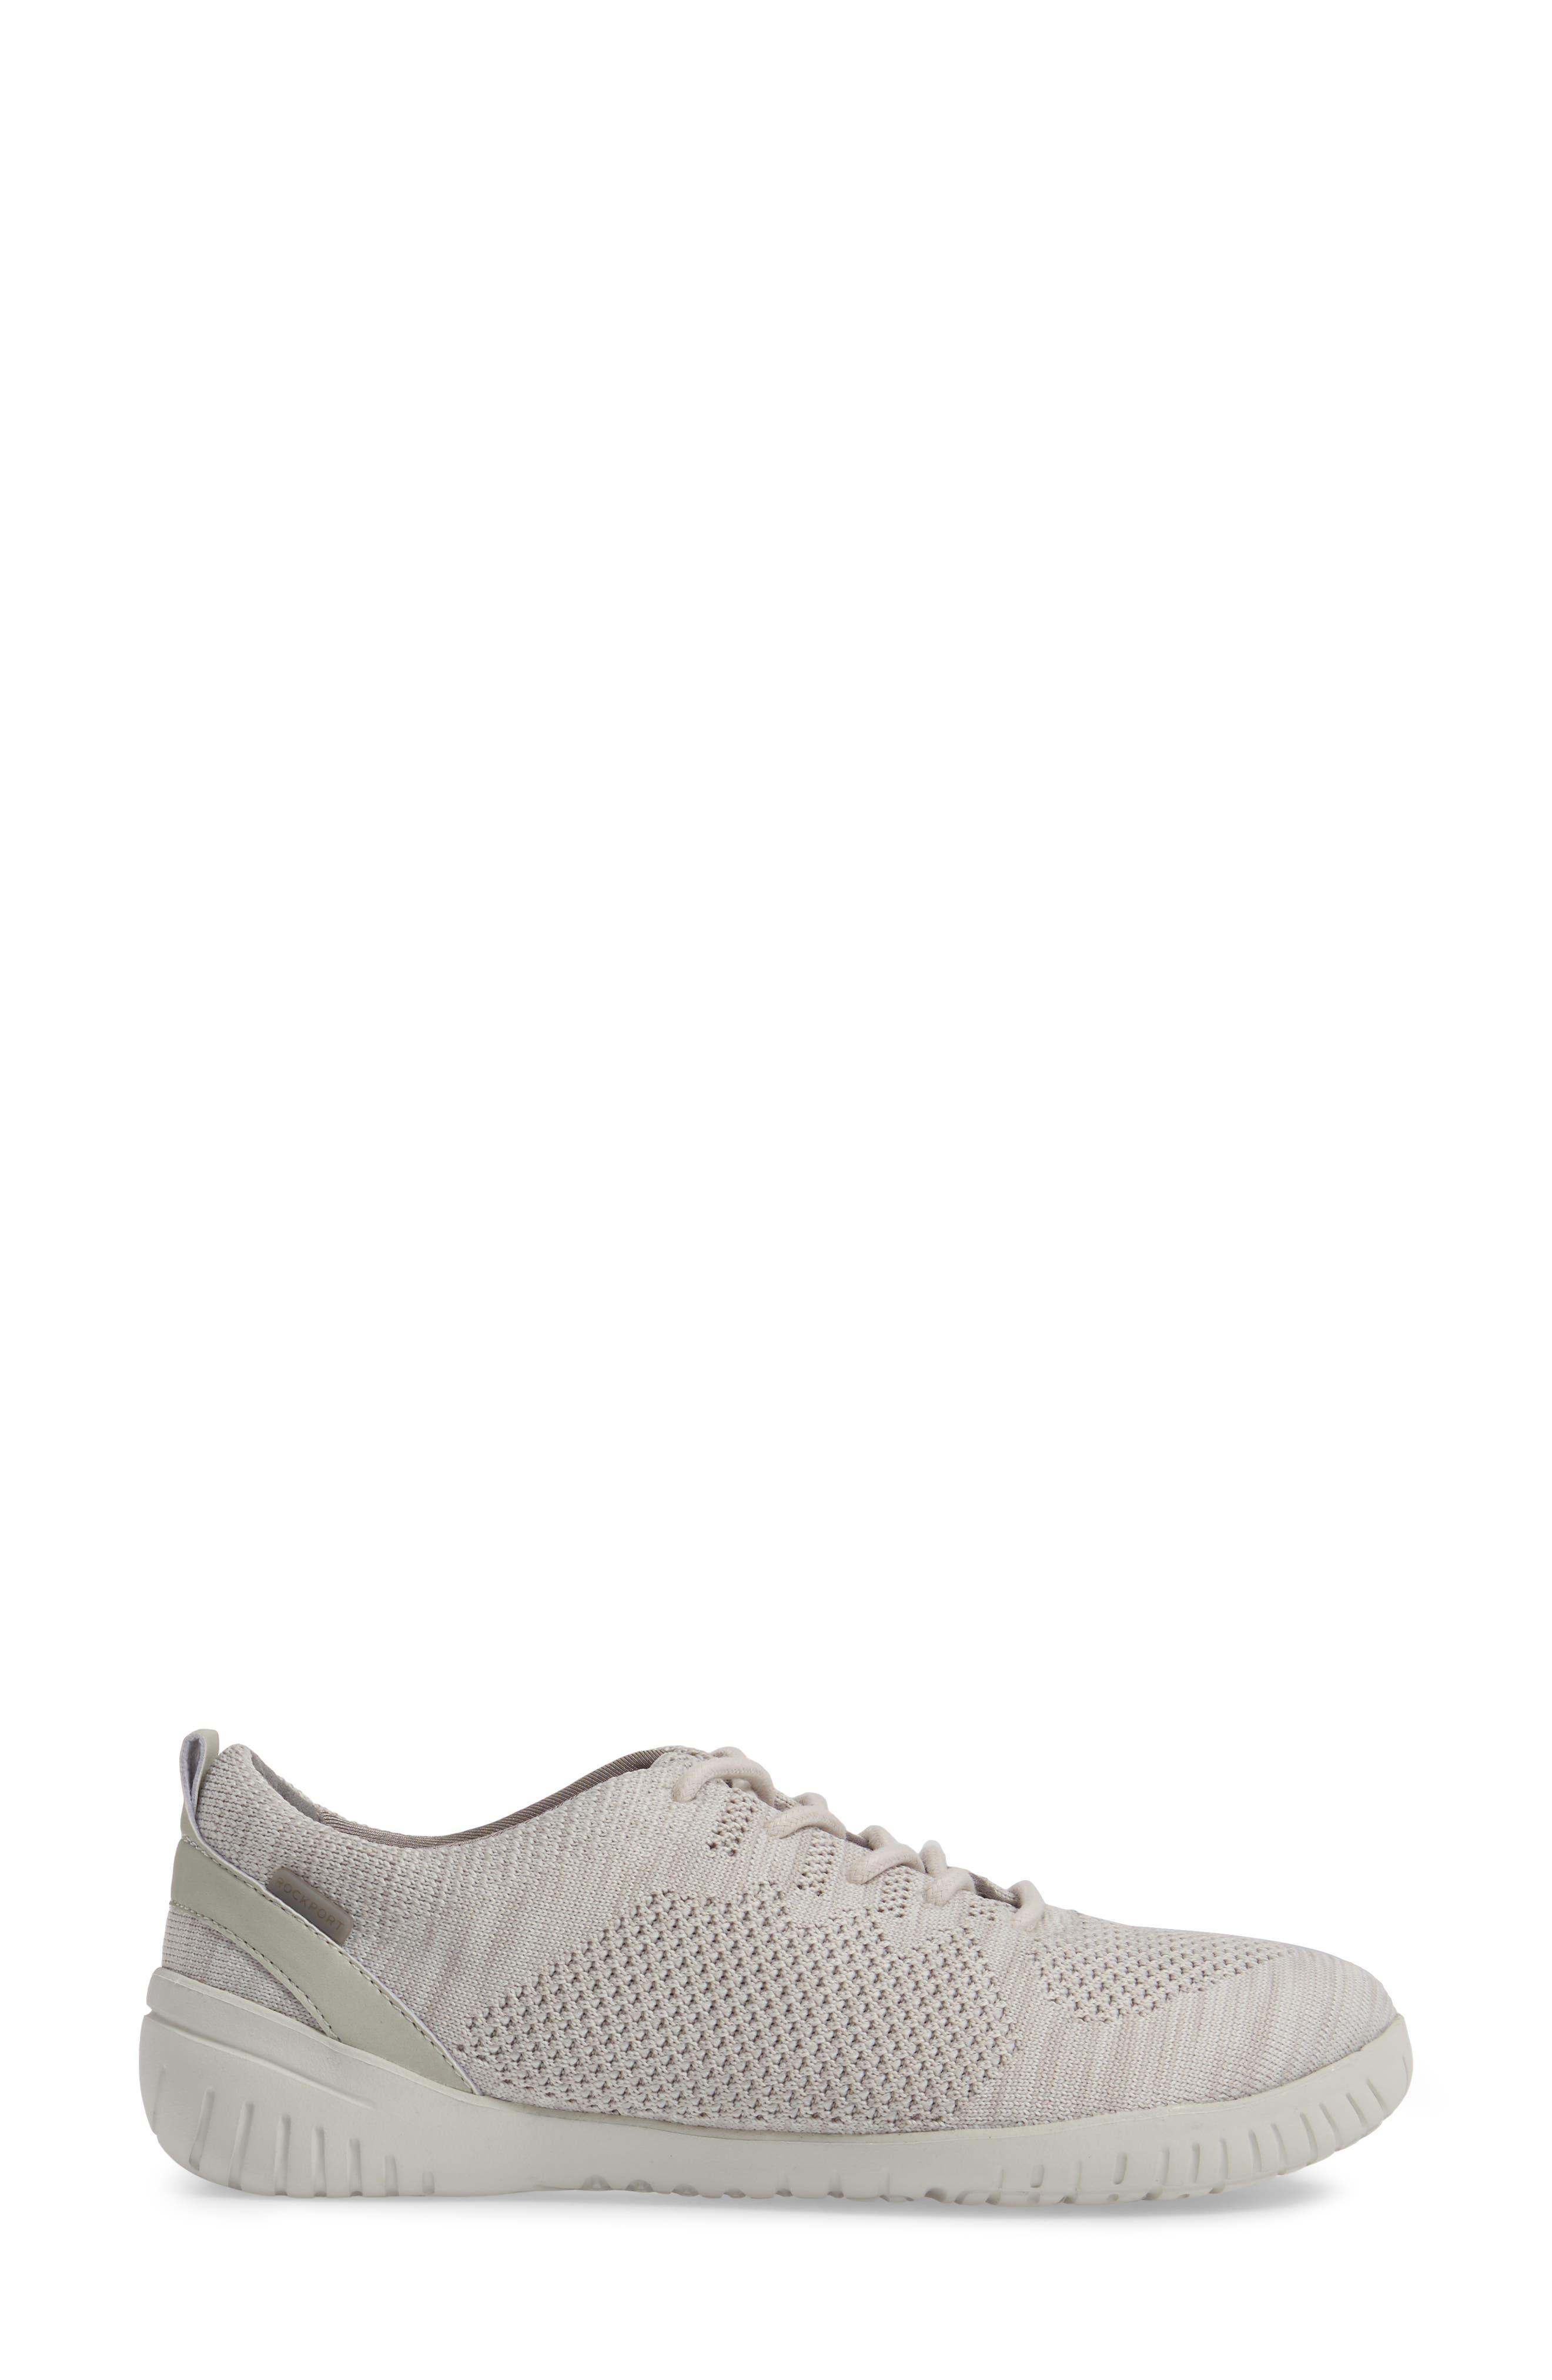 Raelyn Knit Sneaker,                             Alternate thumbnail 3, color,                             Cloud Fabric